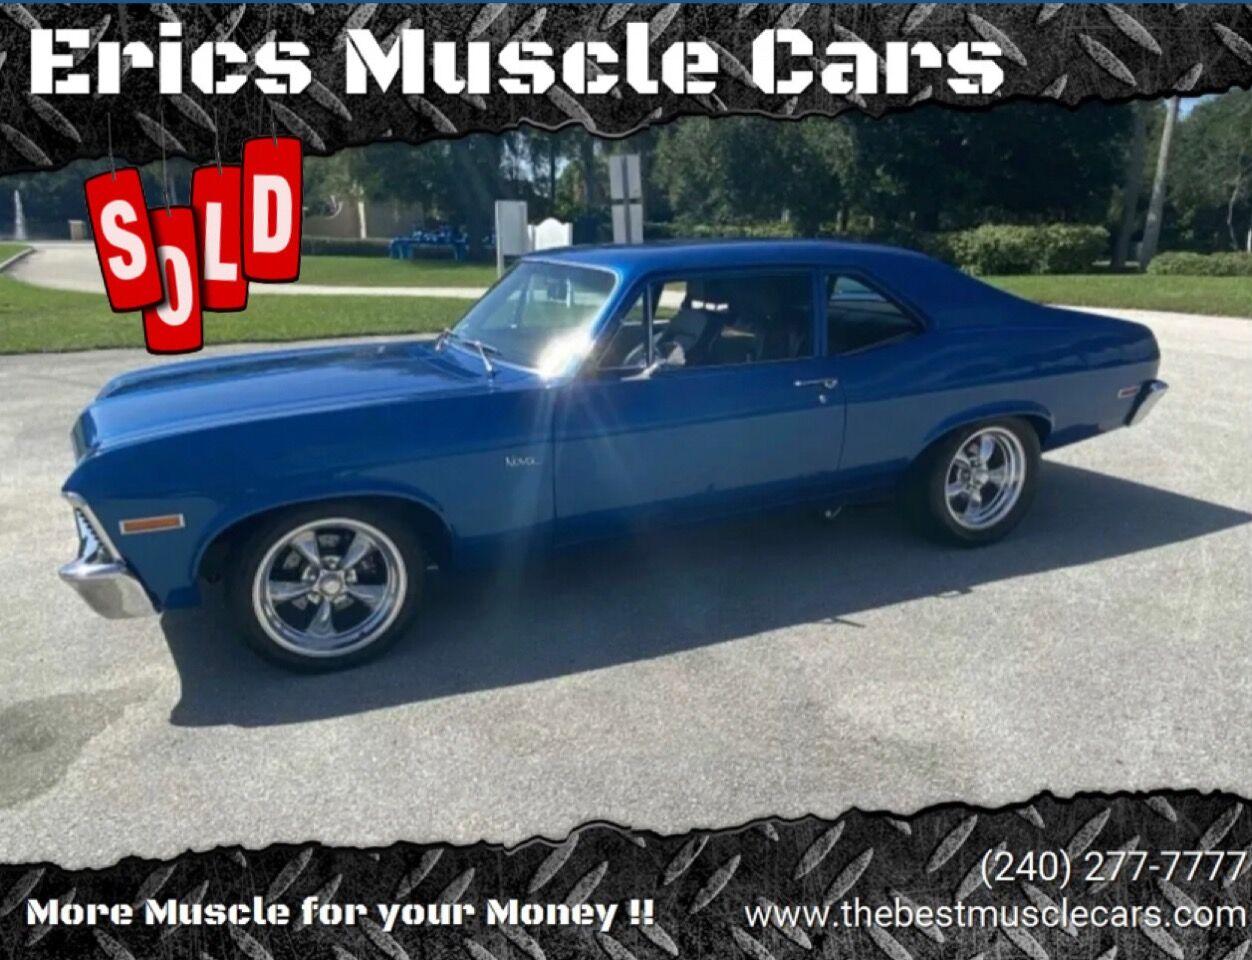 1971 Chevrolet Nova SOLD SOLD SOLD